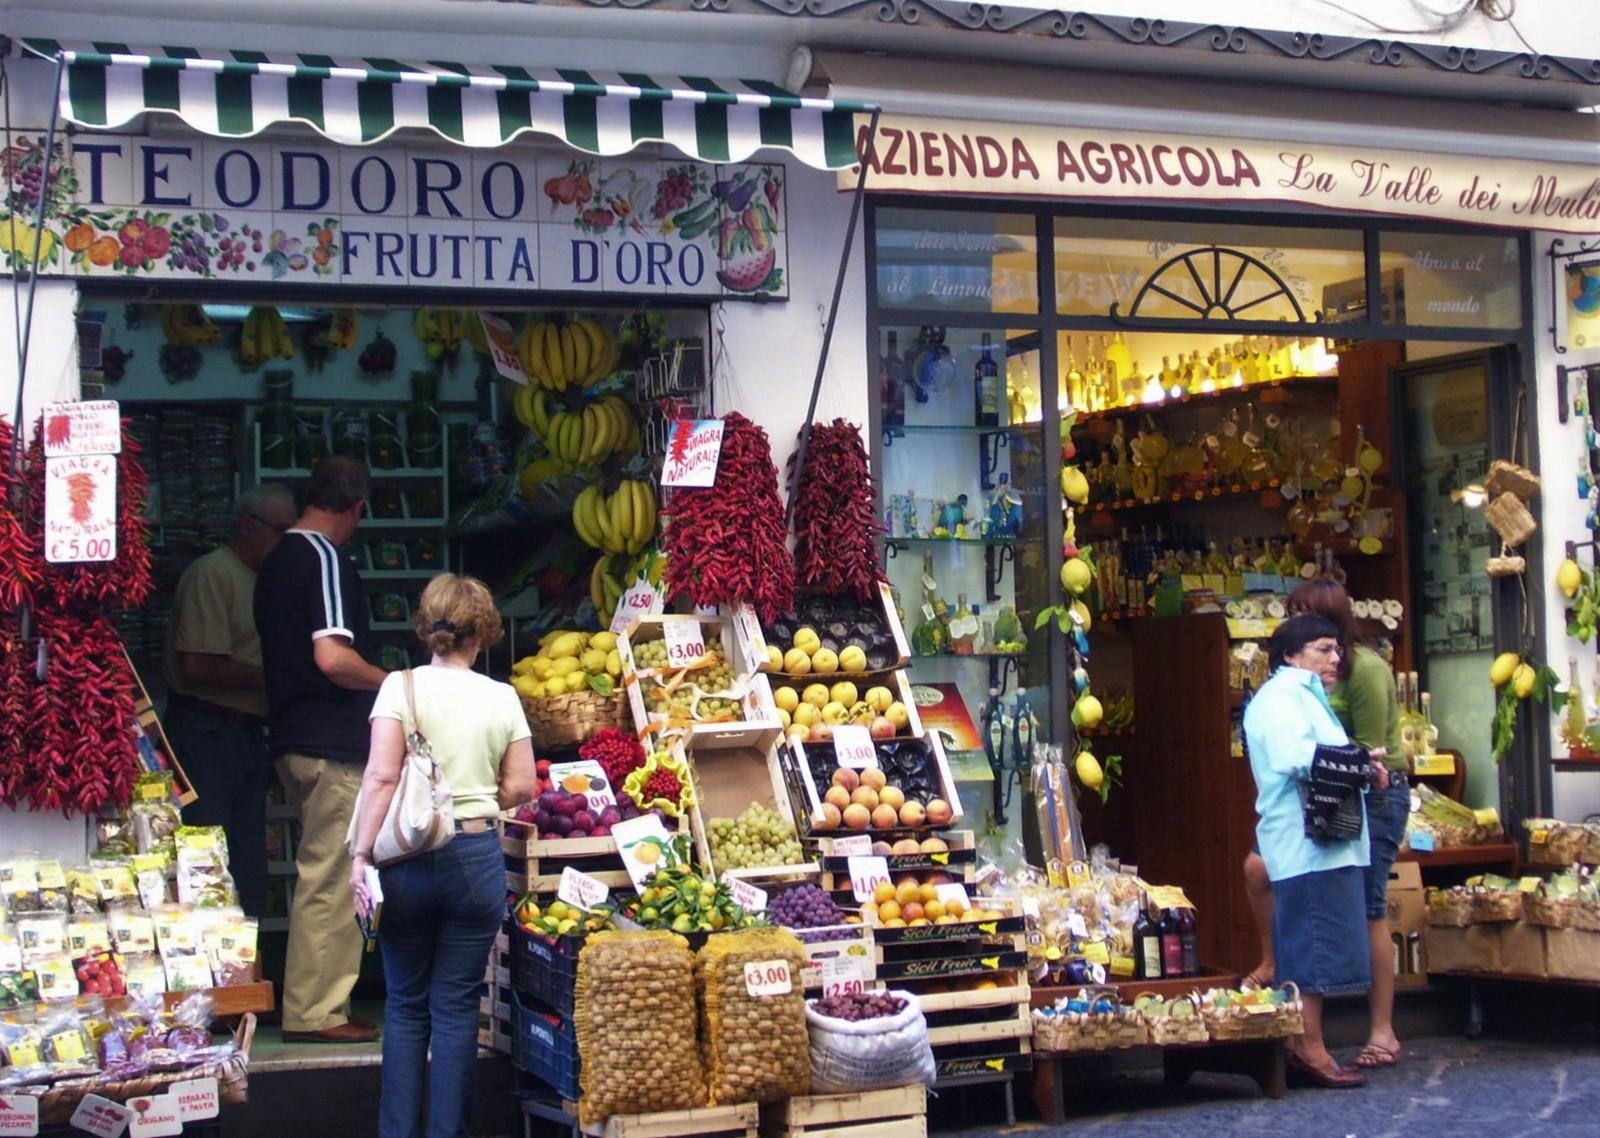 Obst- und Gemüseladen in Amalfi - Amalfitana